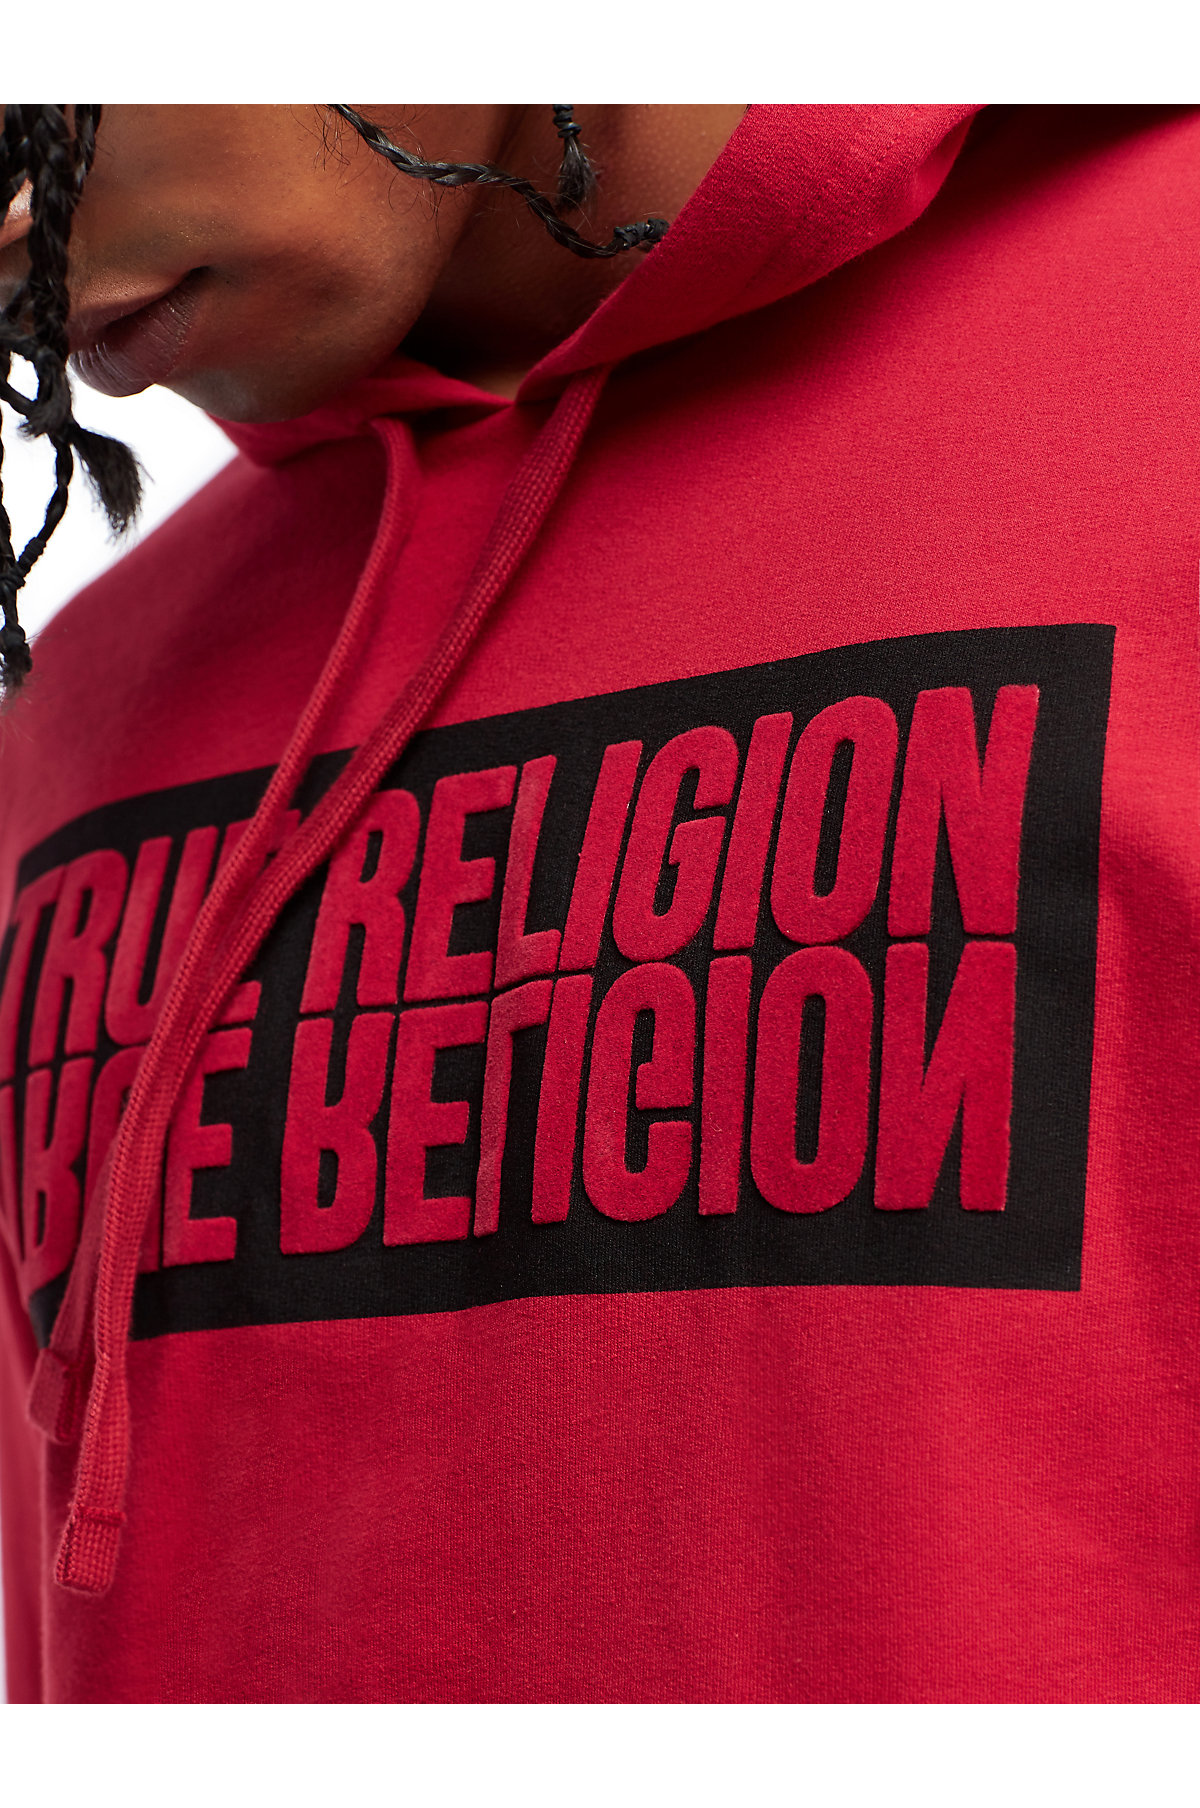 True-Religion-Men-039-s-Mirror-Logo-Reflection-Pullover-Hoodie-Sweatshirt thumbnail 6